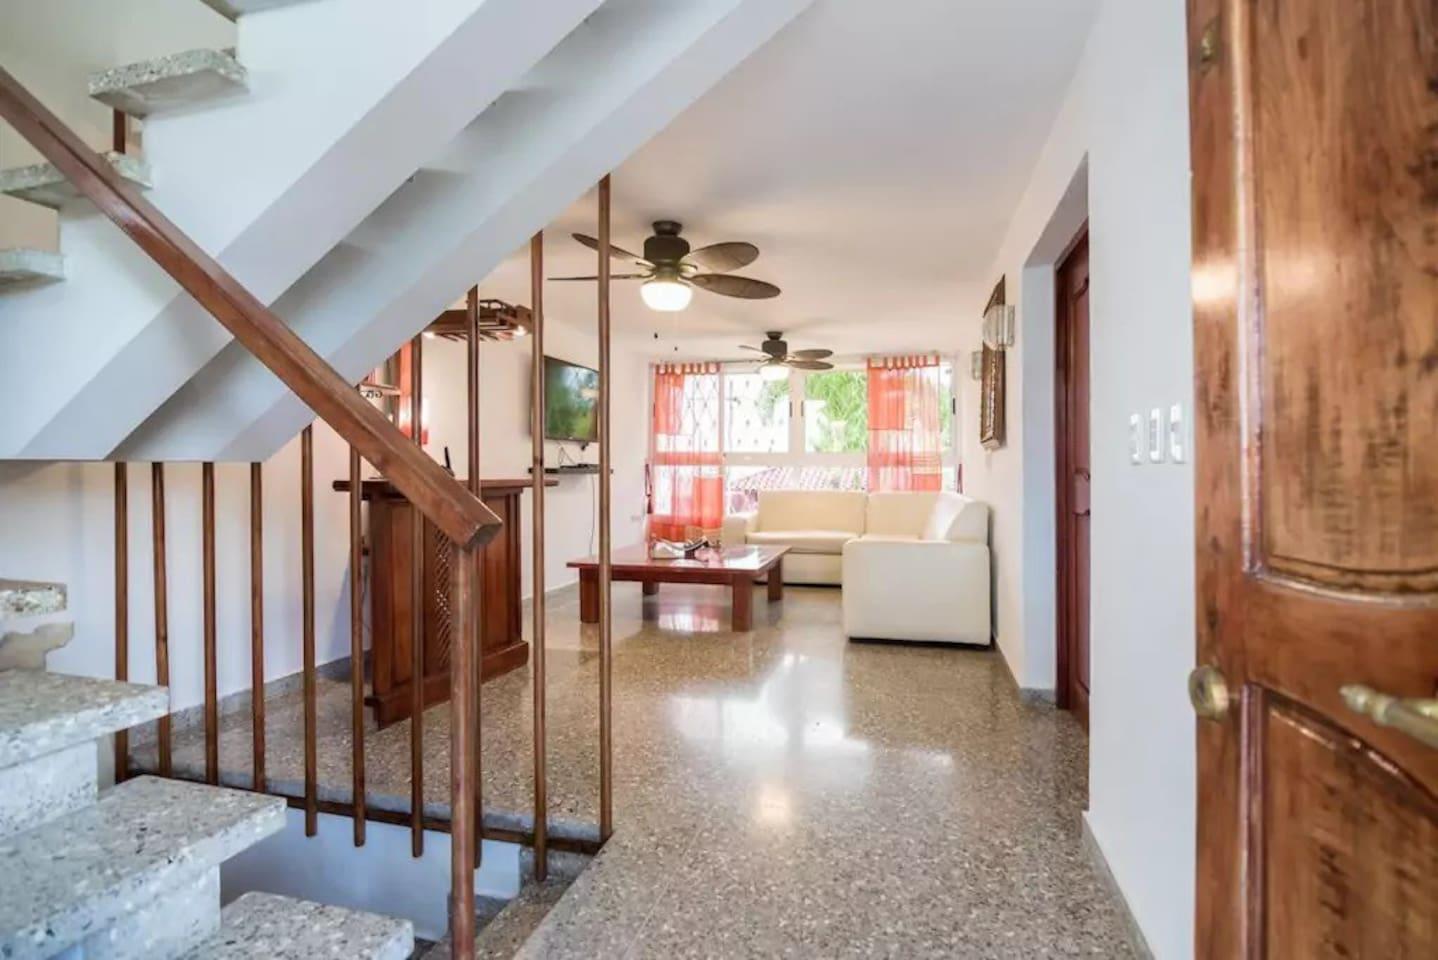 Apartment Villa Don Teto Suite   8 Rooms  Great Havana View photo 26030634